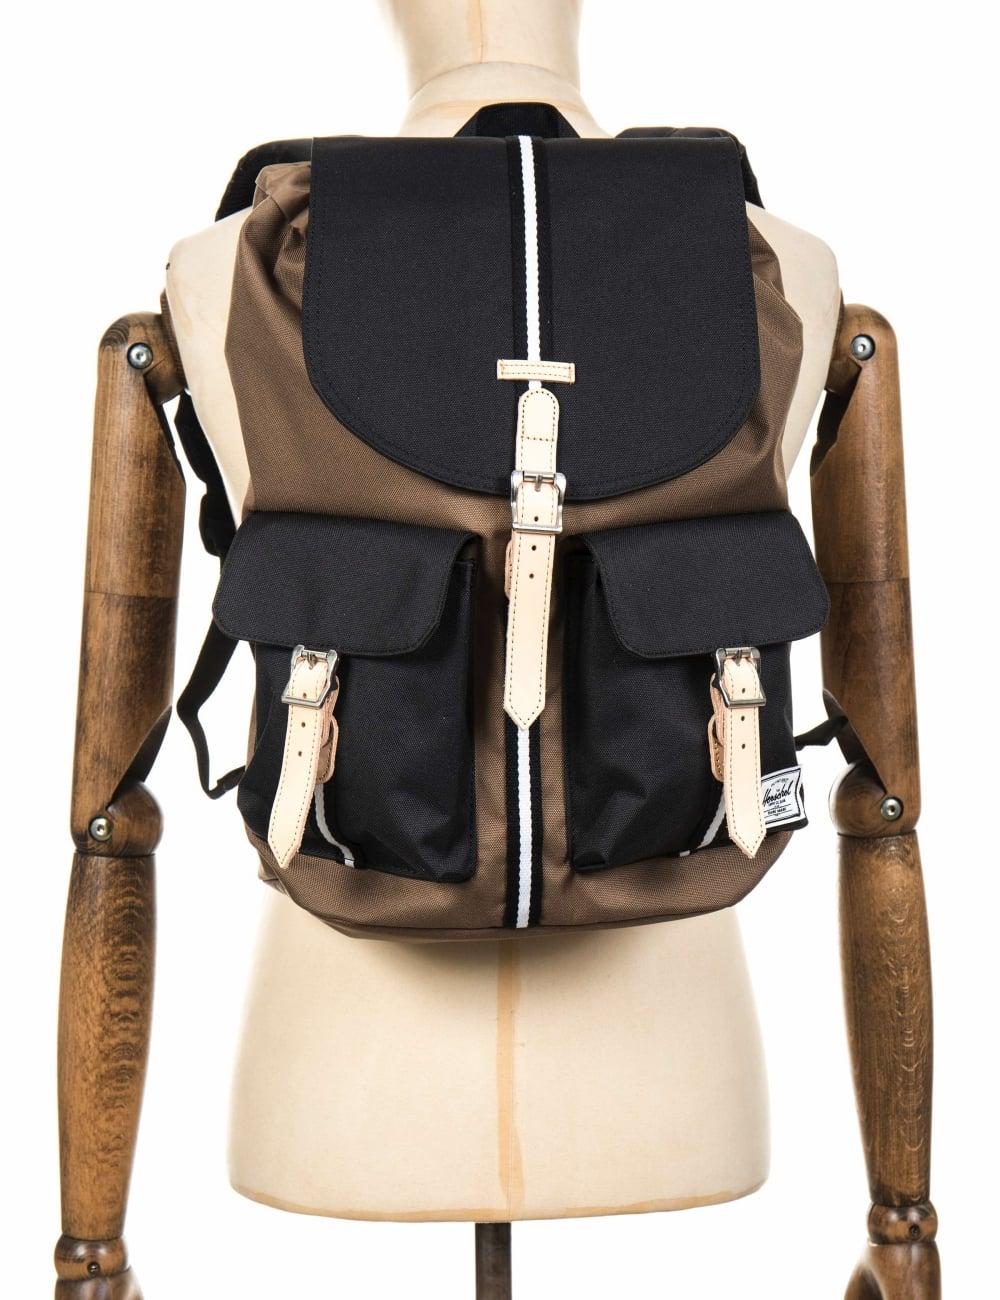 78a97e7c32 Herschel Supply Co Dawson 20.5L Backpack - Cub Black White ...